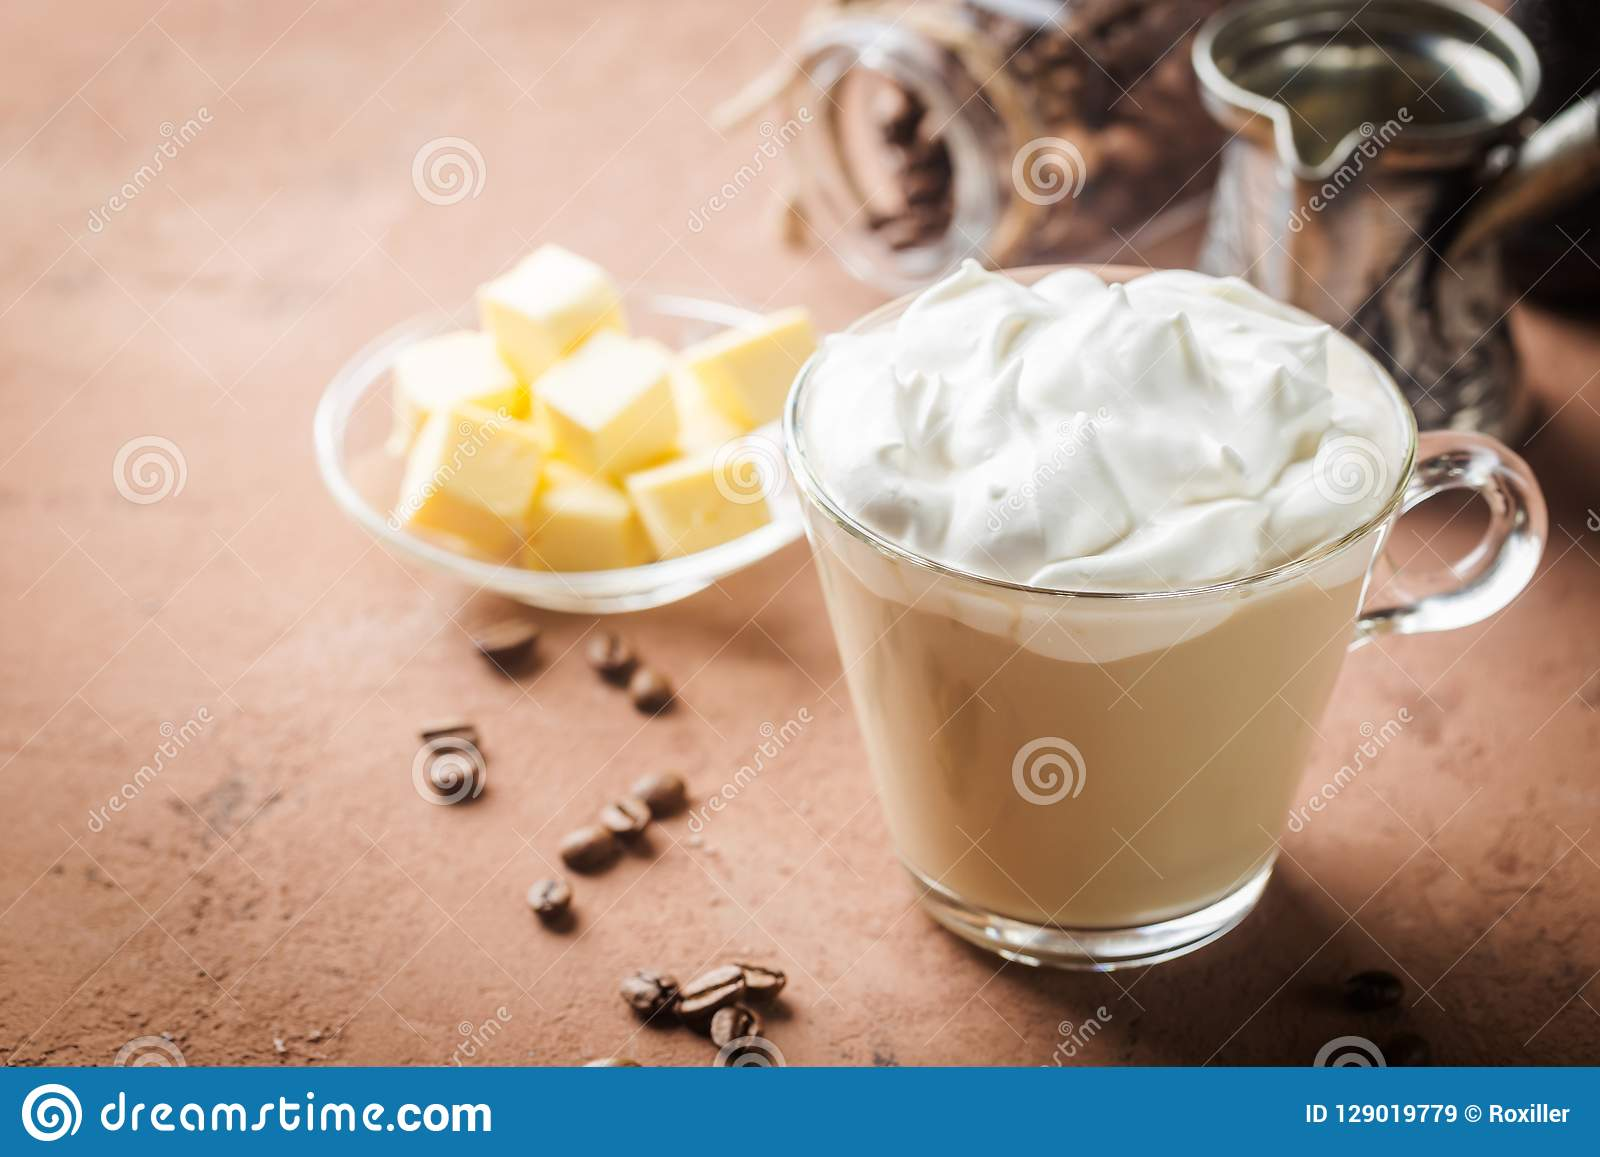 Skottsäkert kaffe, keto-frukost